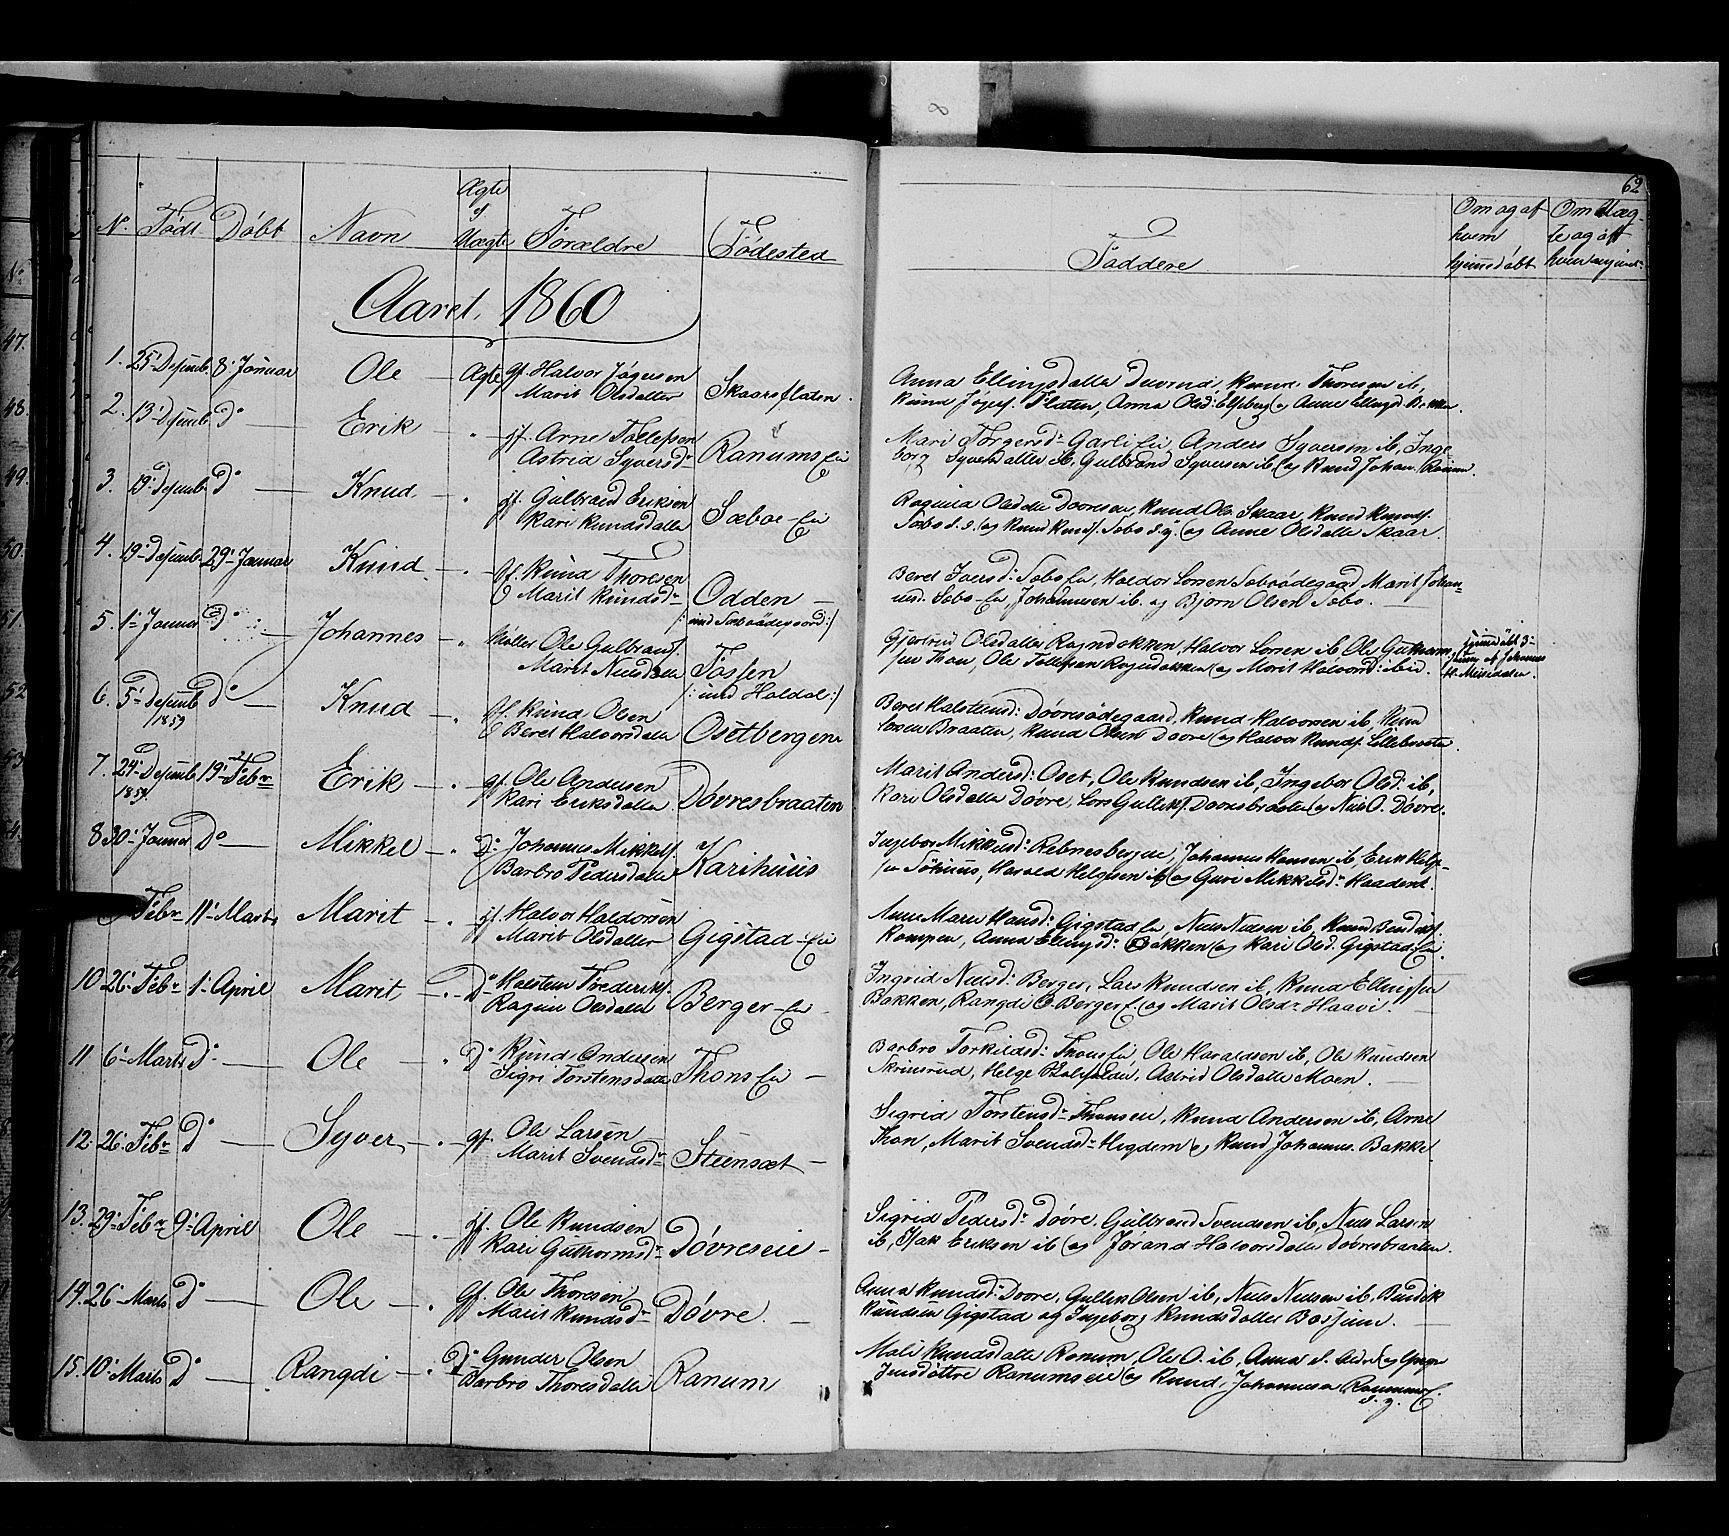 SAH, Nord-Aurdal prestekontor, Ministerialbok nr. 7, 1842-1863, s. 62